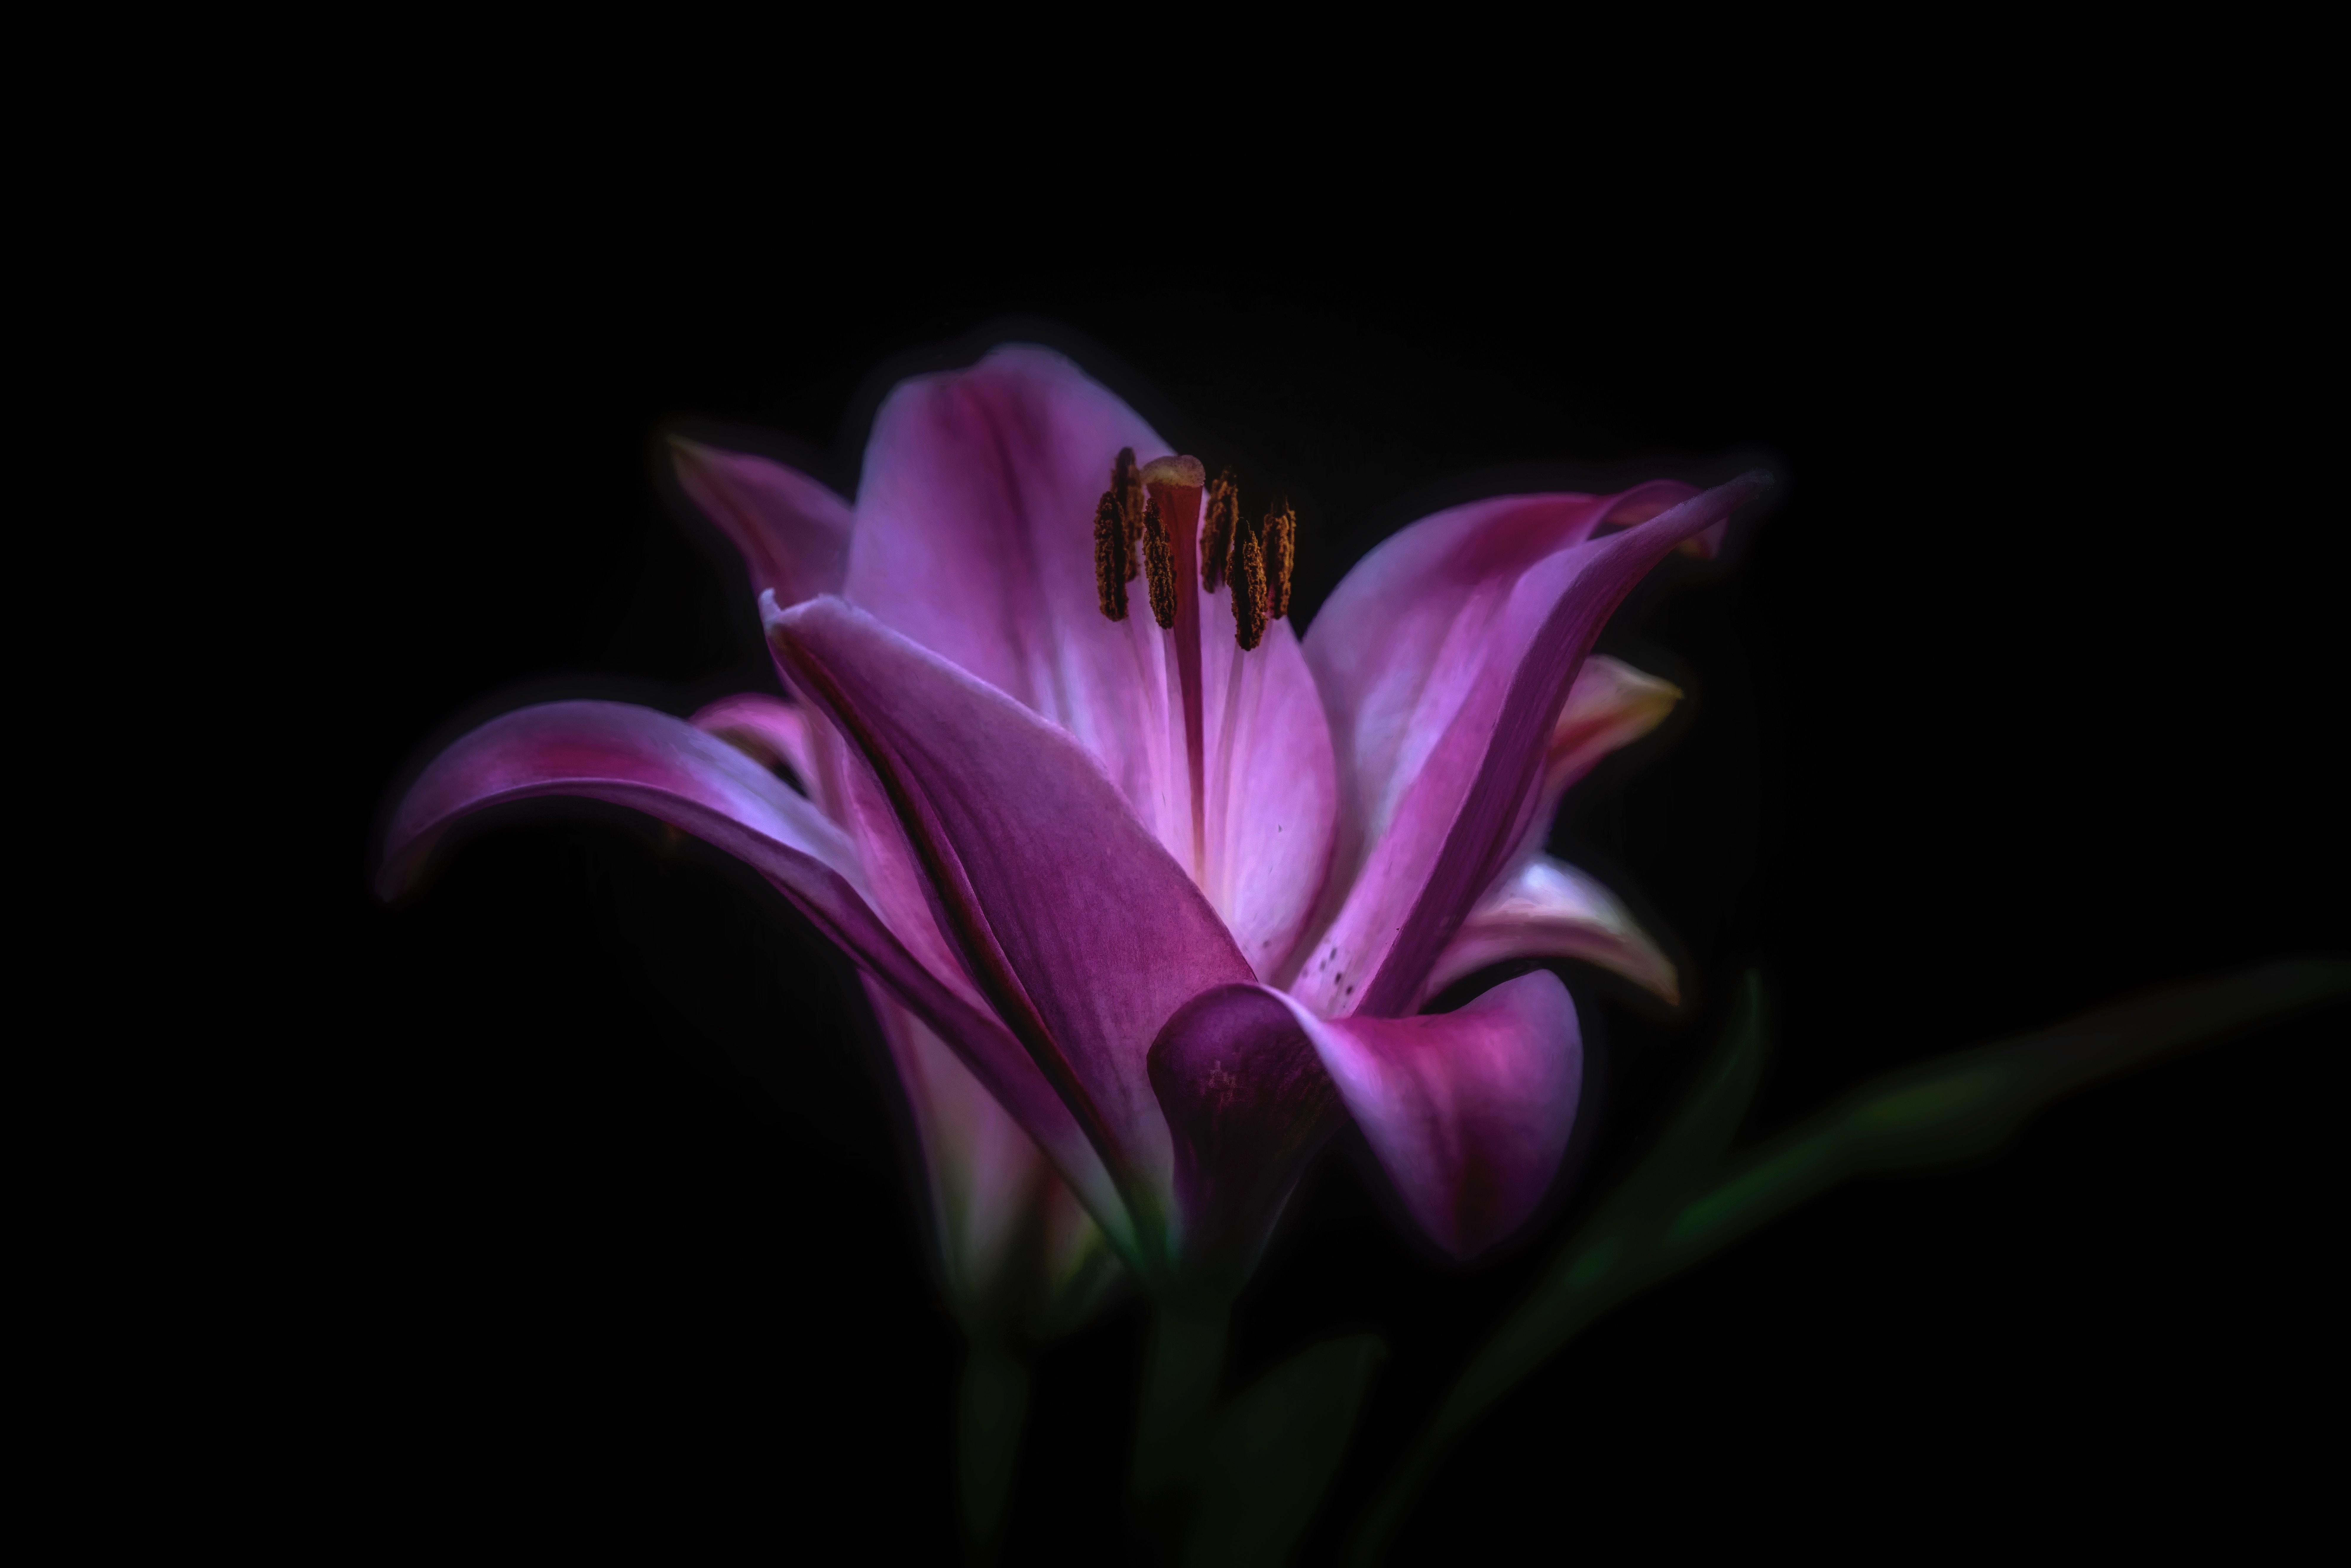 Purple lilies 8k ultra hd wallpaper background image 7952x5304 lily purple flower wallpapers id872778 izmirmasajfo